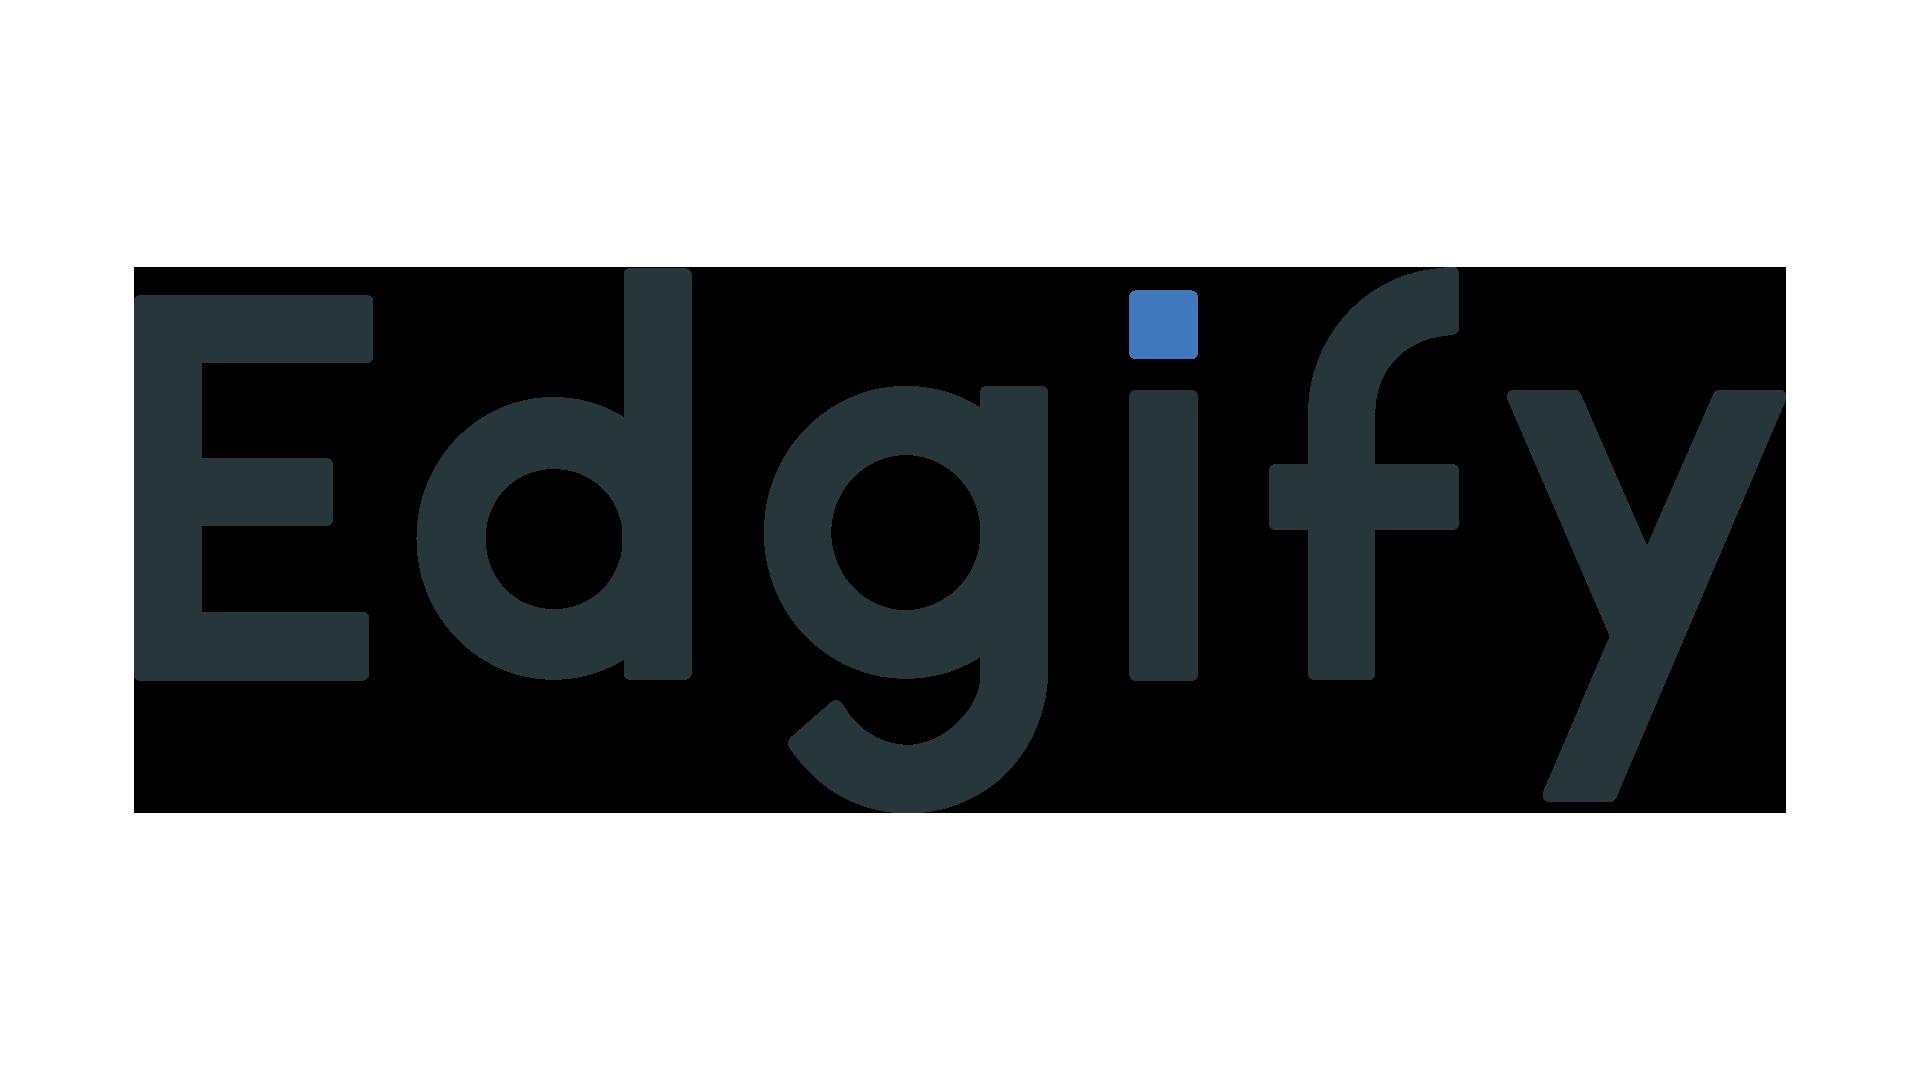 Edgify logo